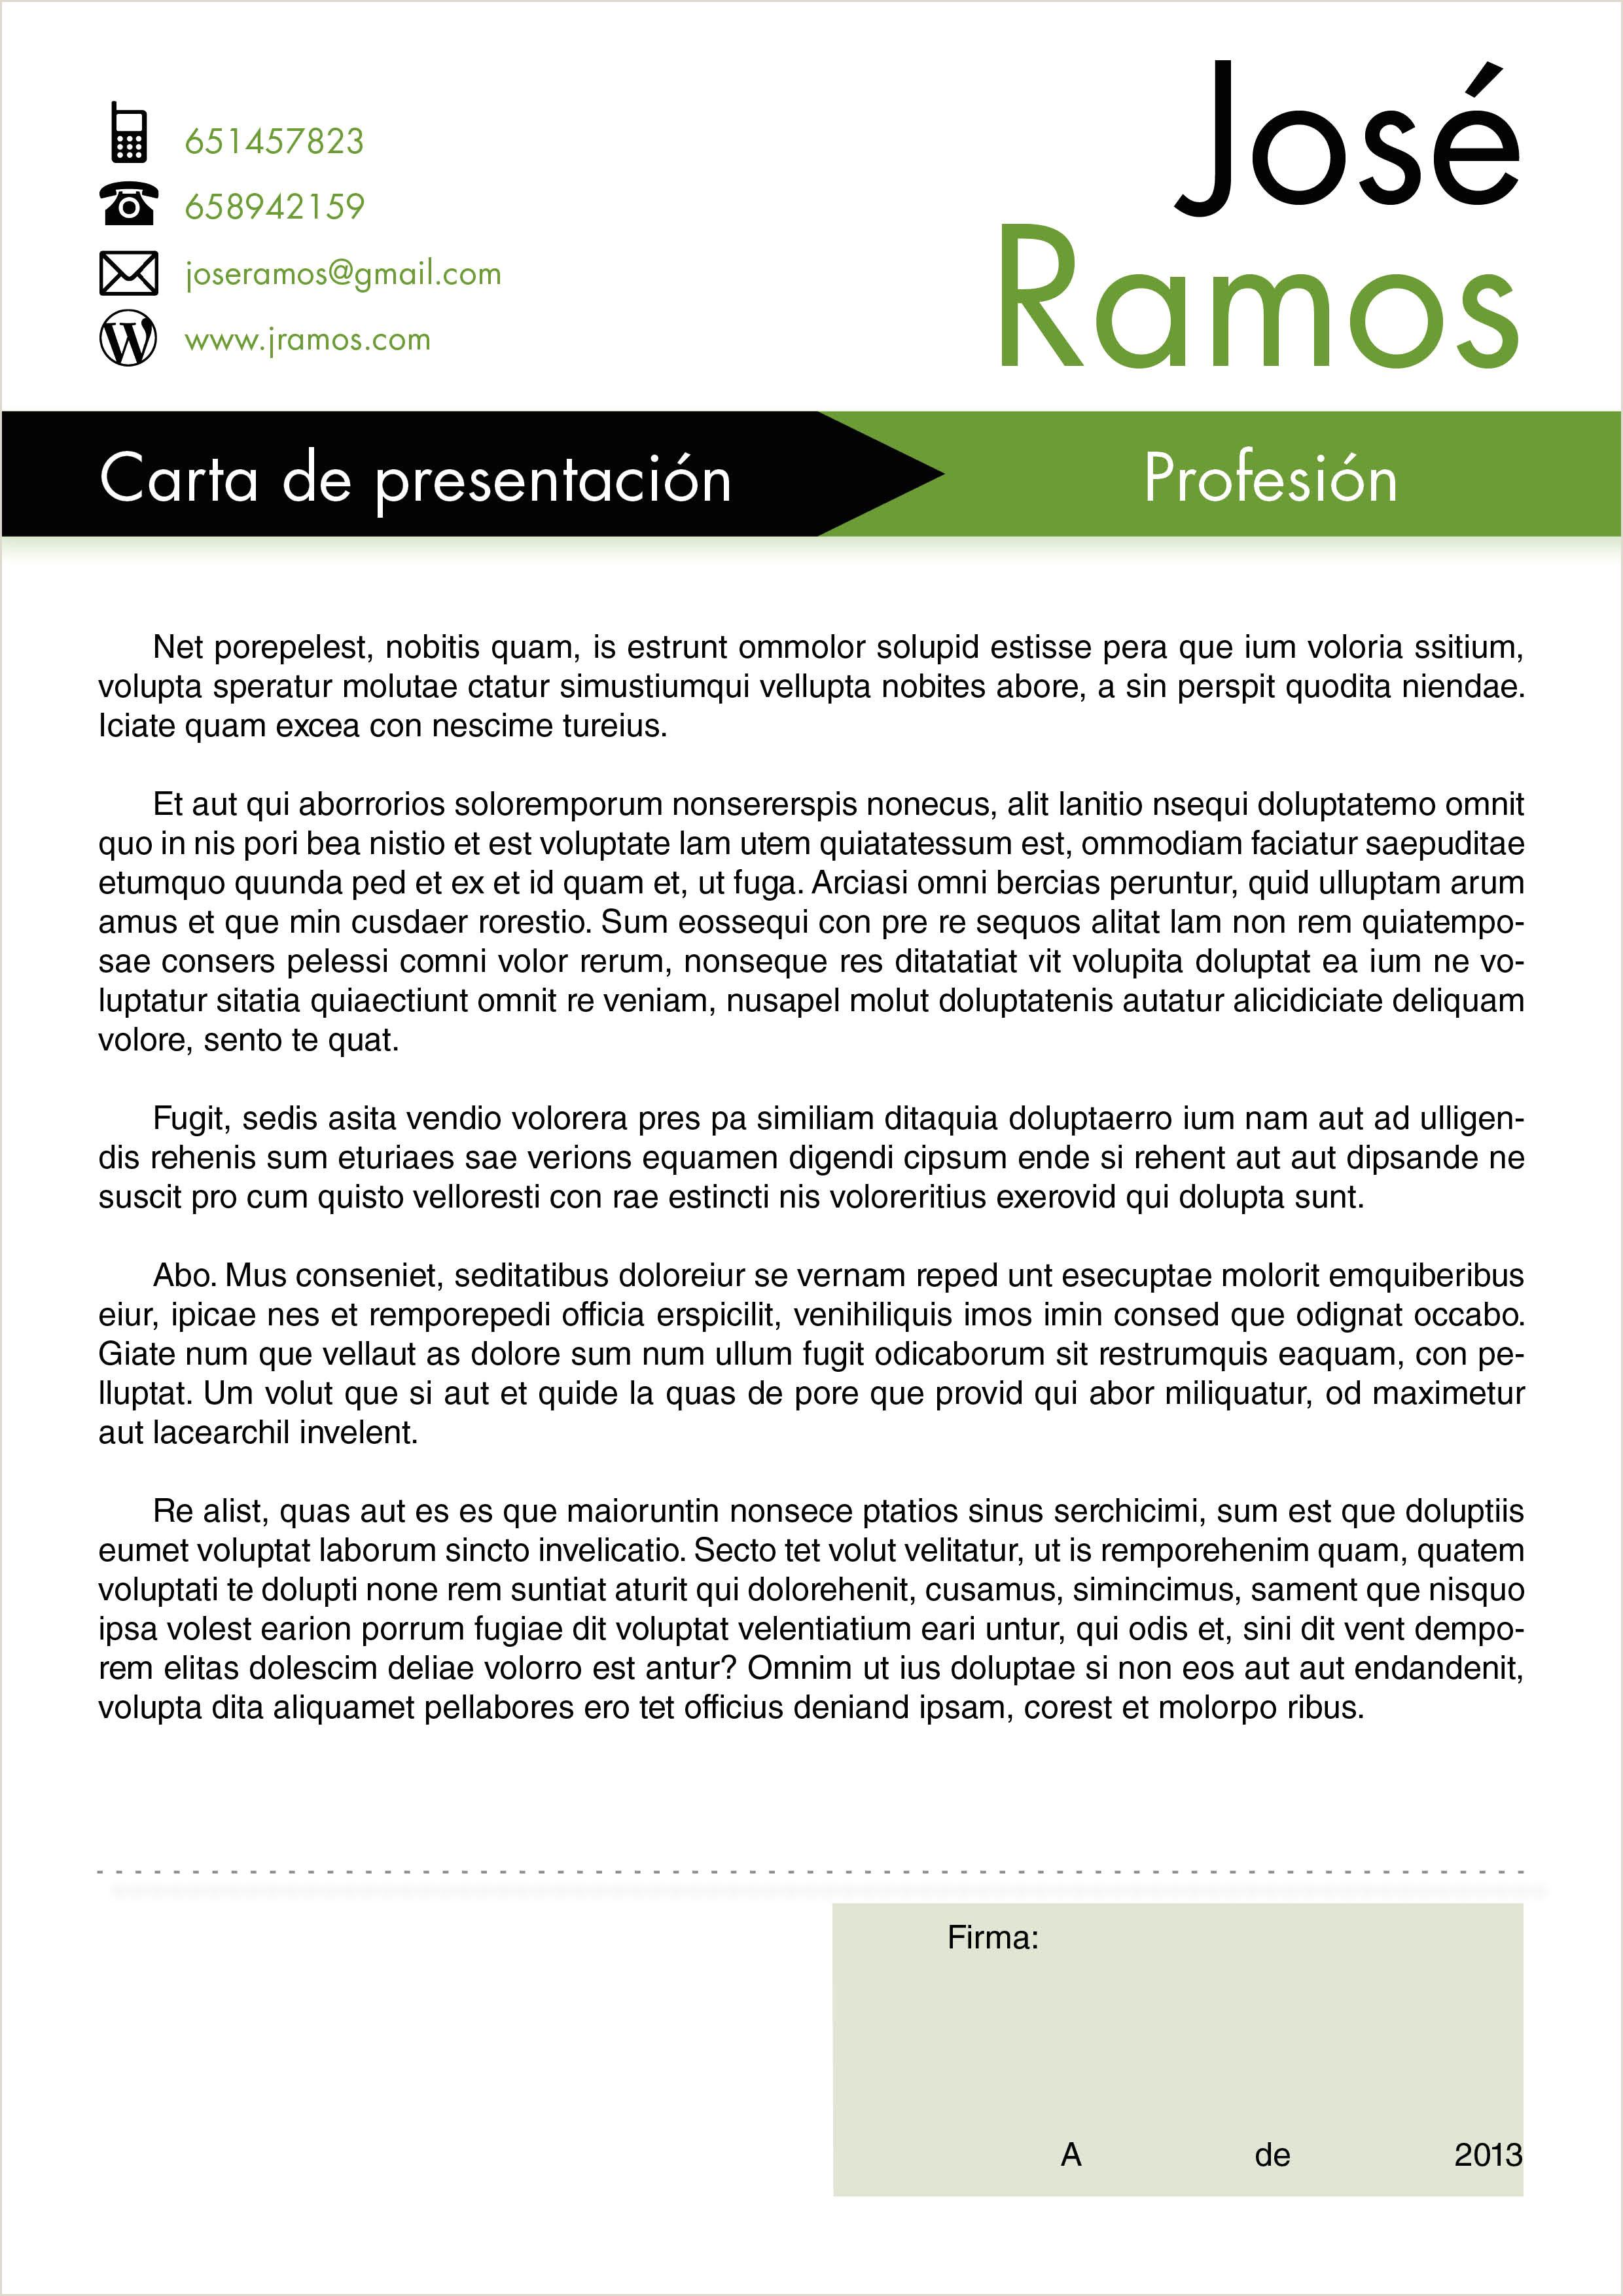 Formato De Hoja De Vida Gratis En Word Modelos Curriculum Vitae Ejemplos Word Custom Writing Online